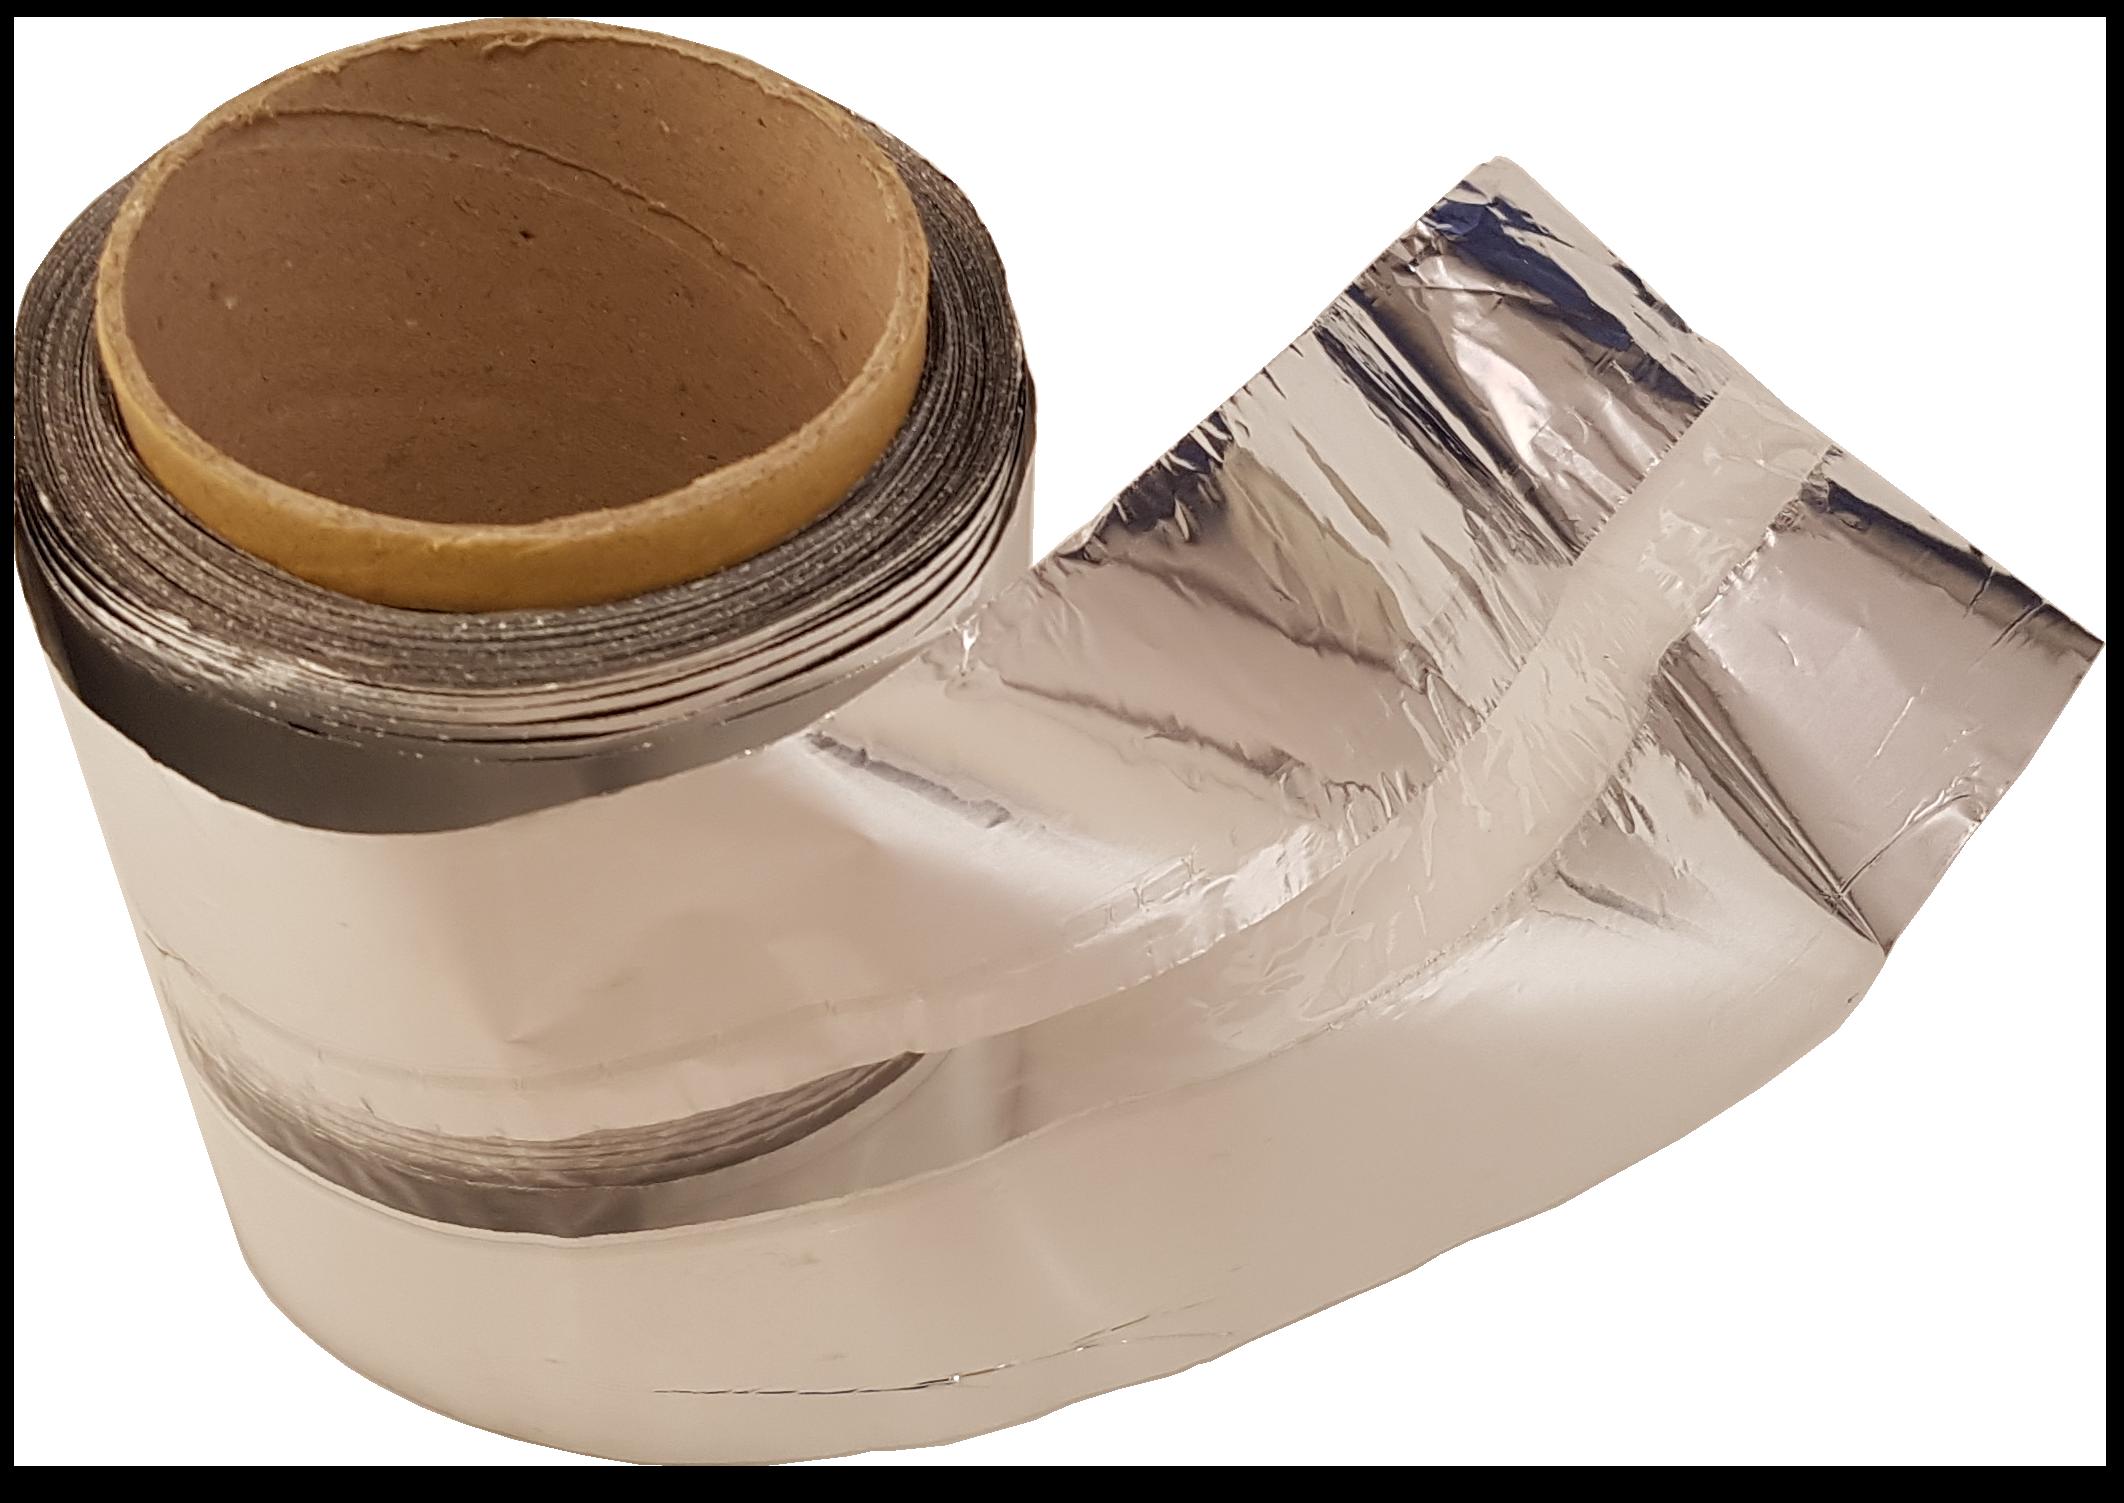 aluminiumsfolie i sko